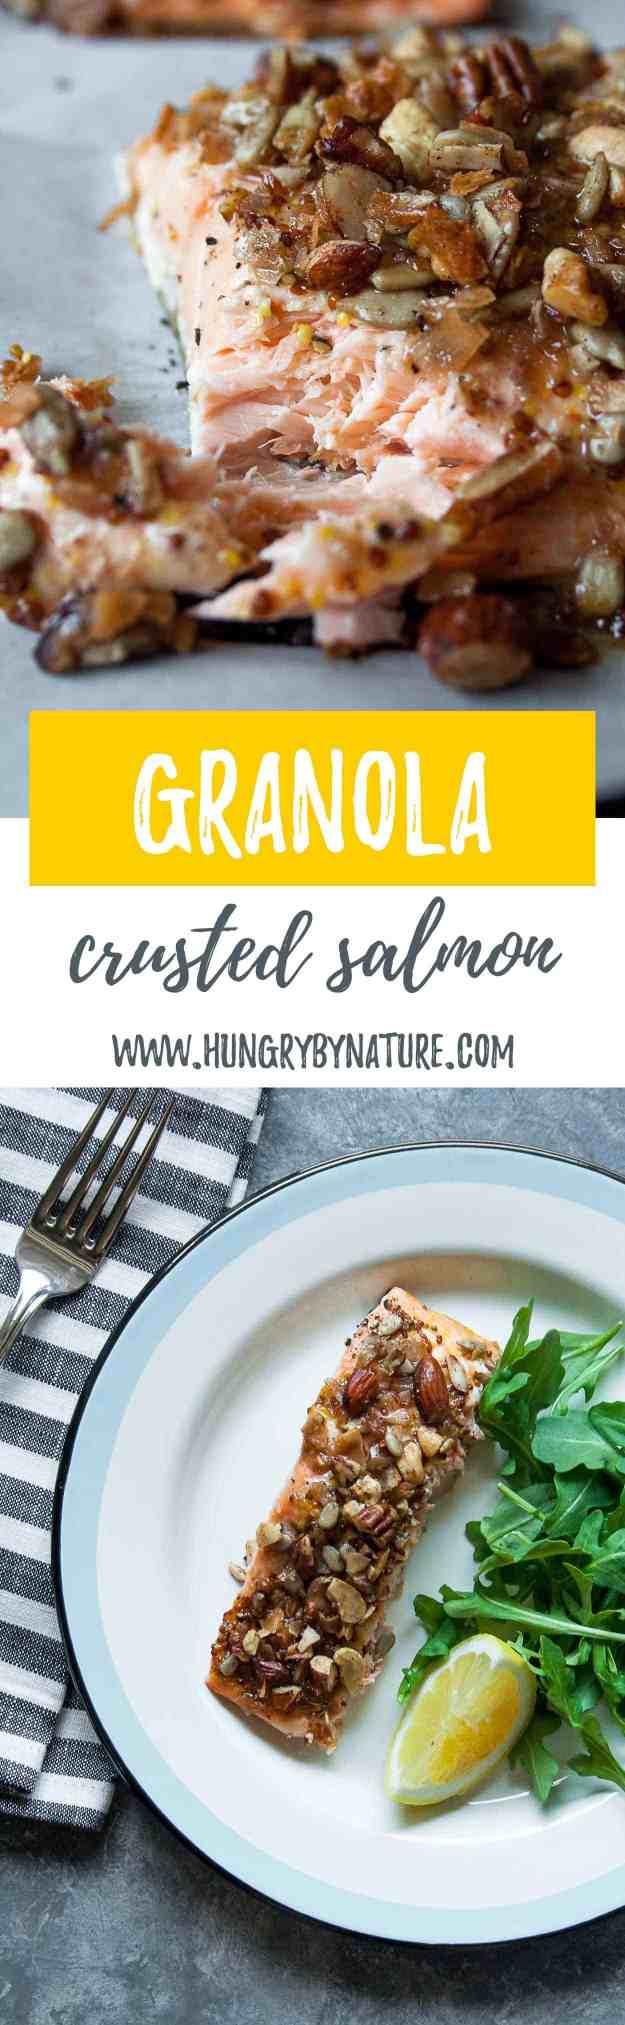 Grain Free Granola Crusted Salmon | #oven #baked #easy #paleo #recipe #honey #mustard #20minutes | www.hungrybynature.com